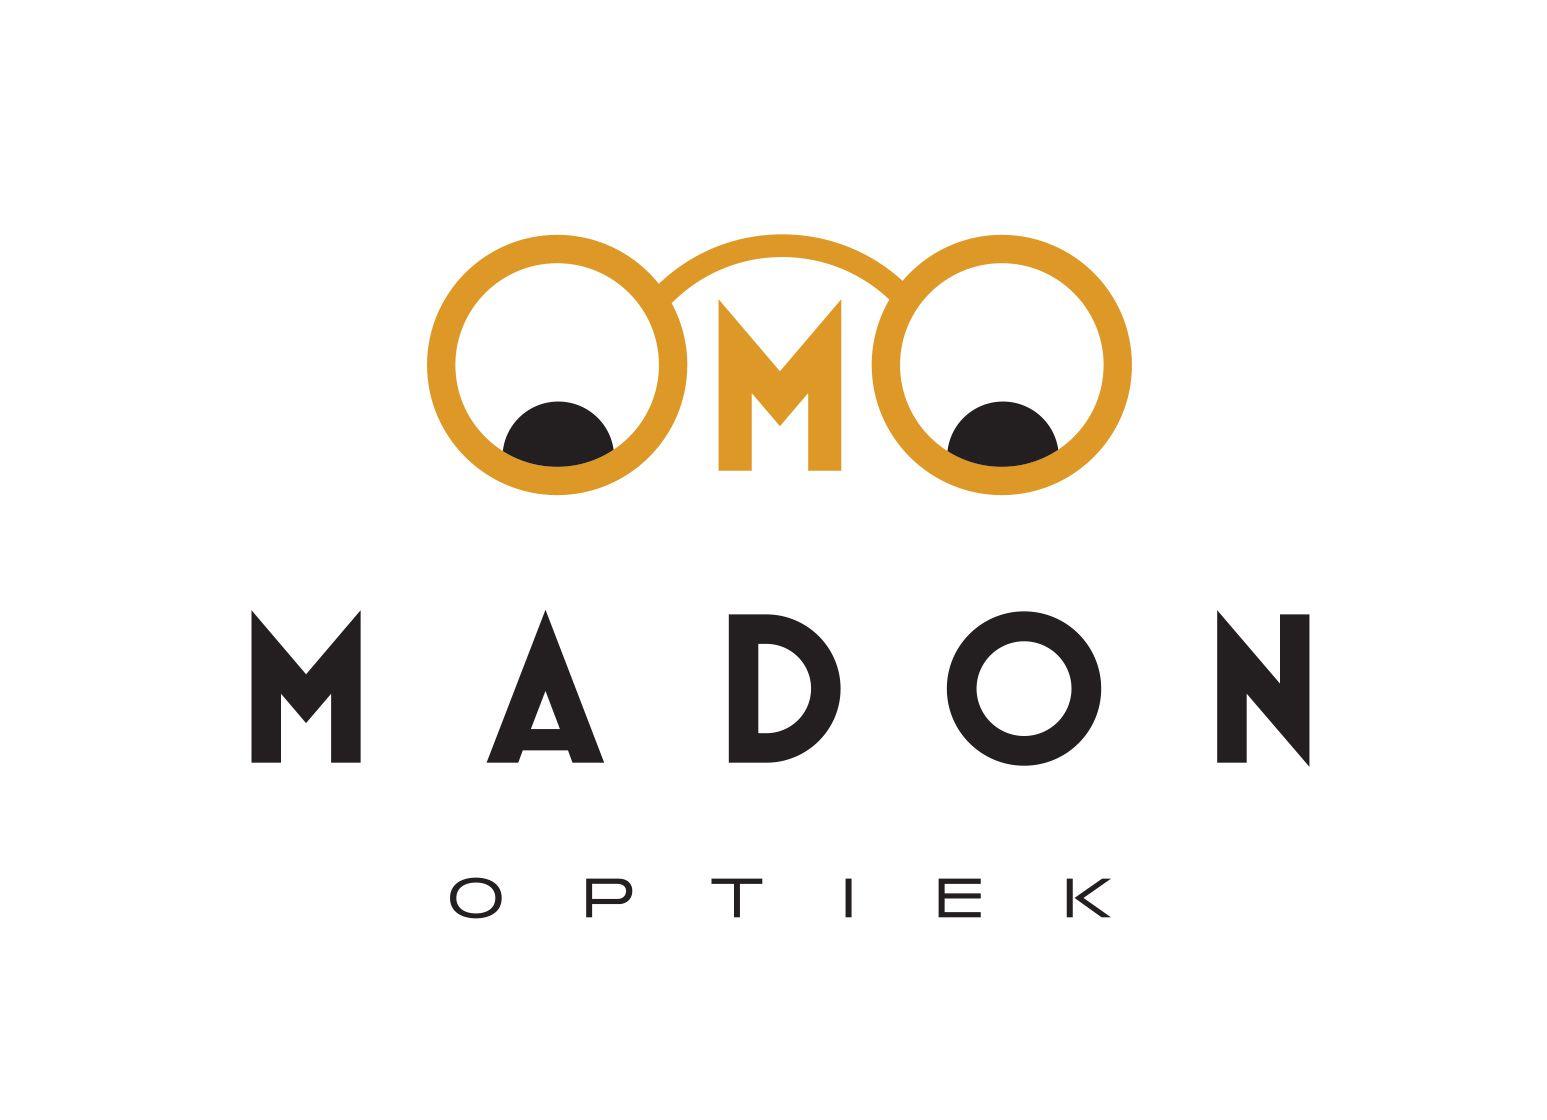 Logo optiek Madon